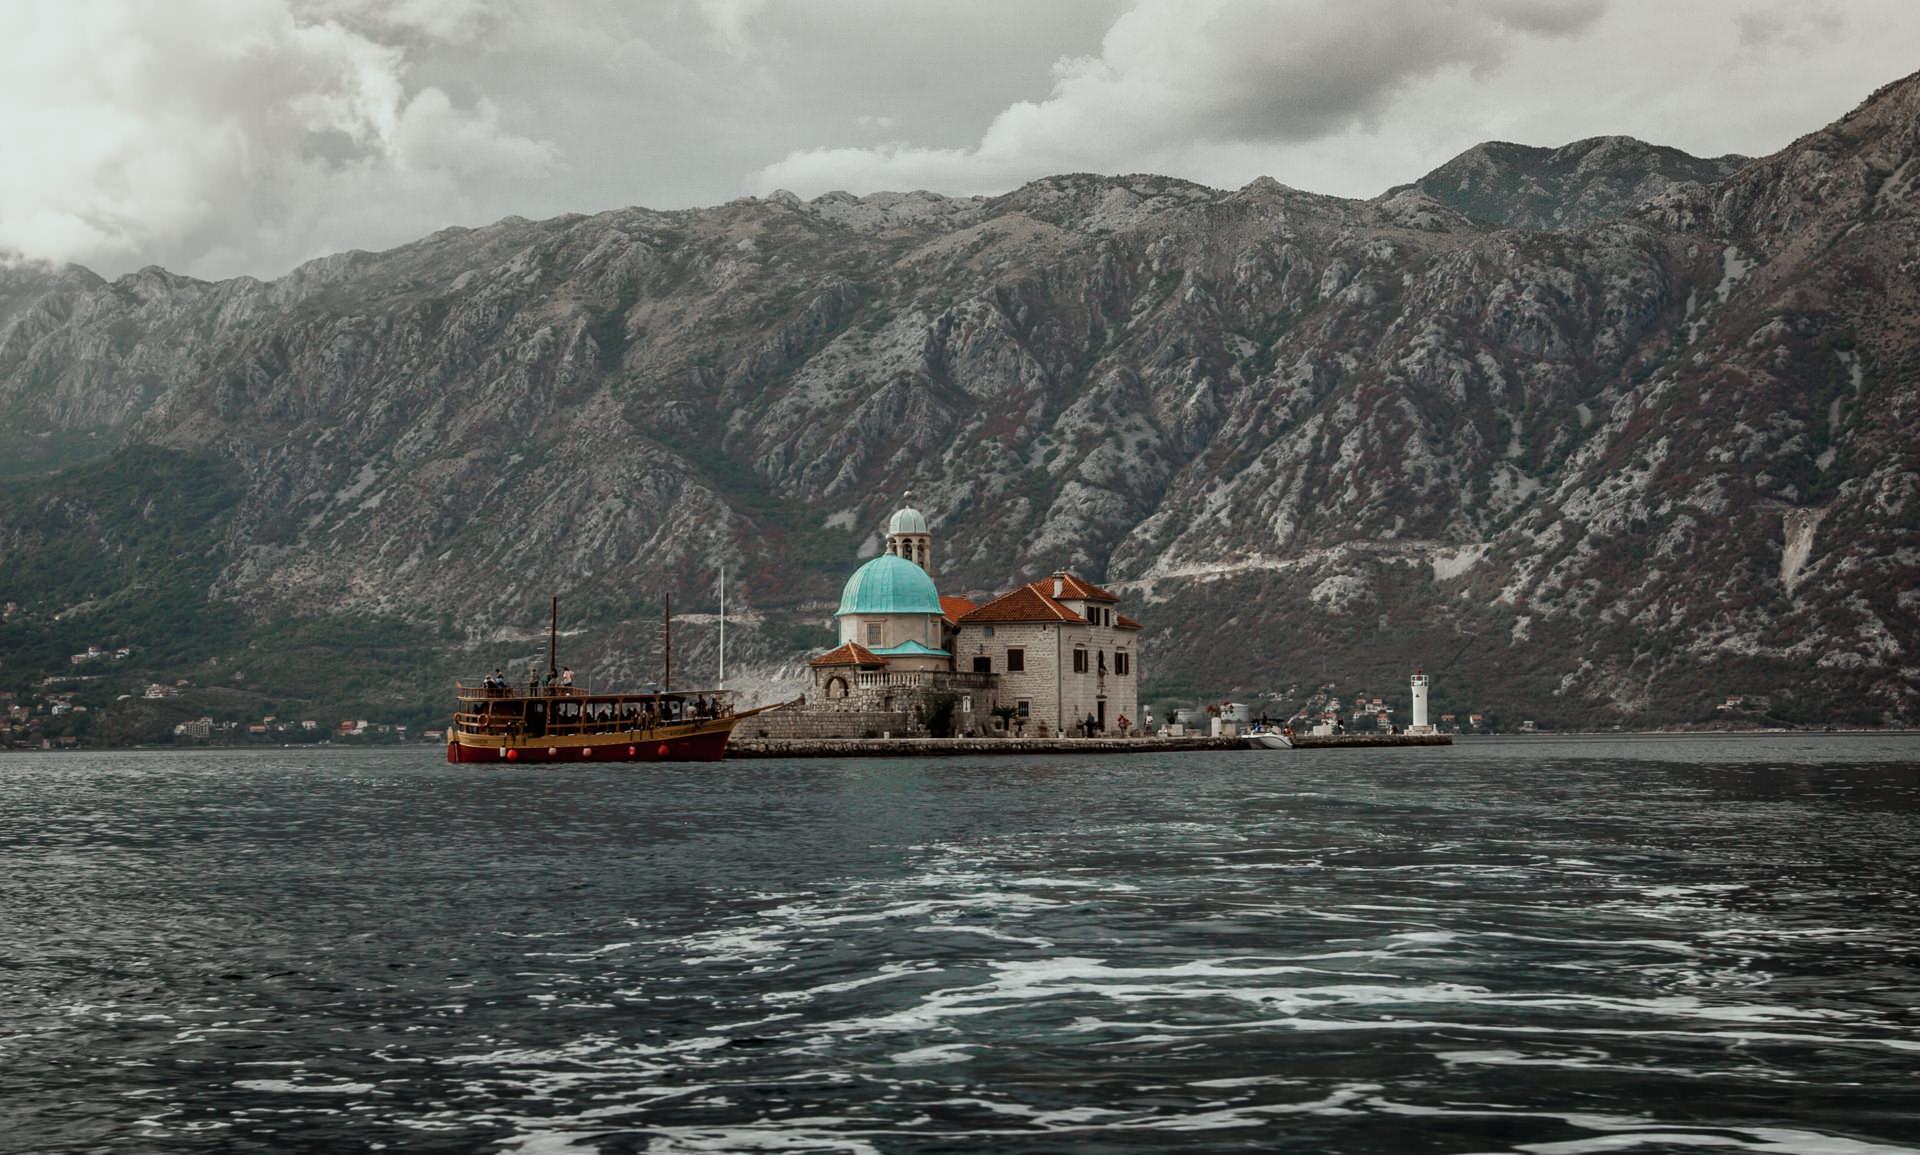 Boka Kotorska - Perast